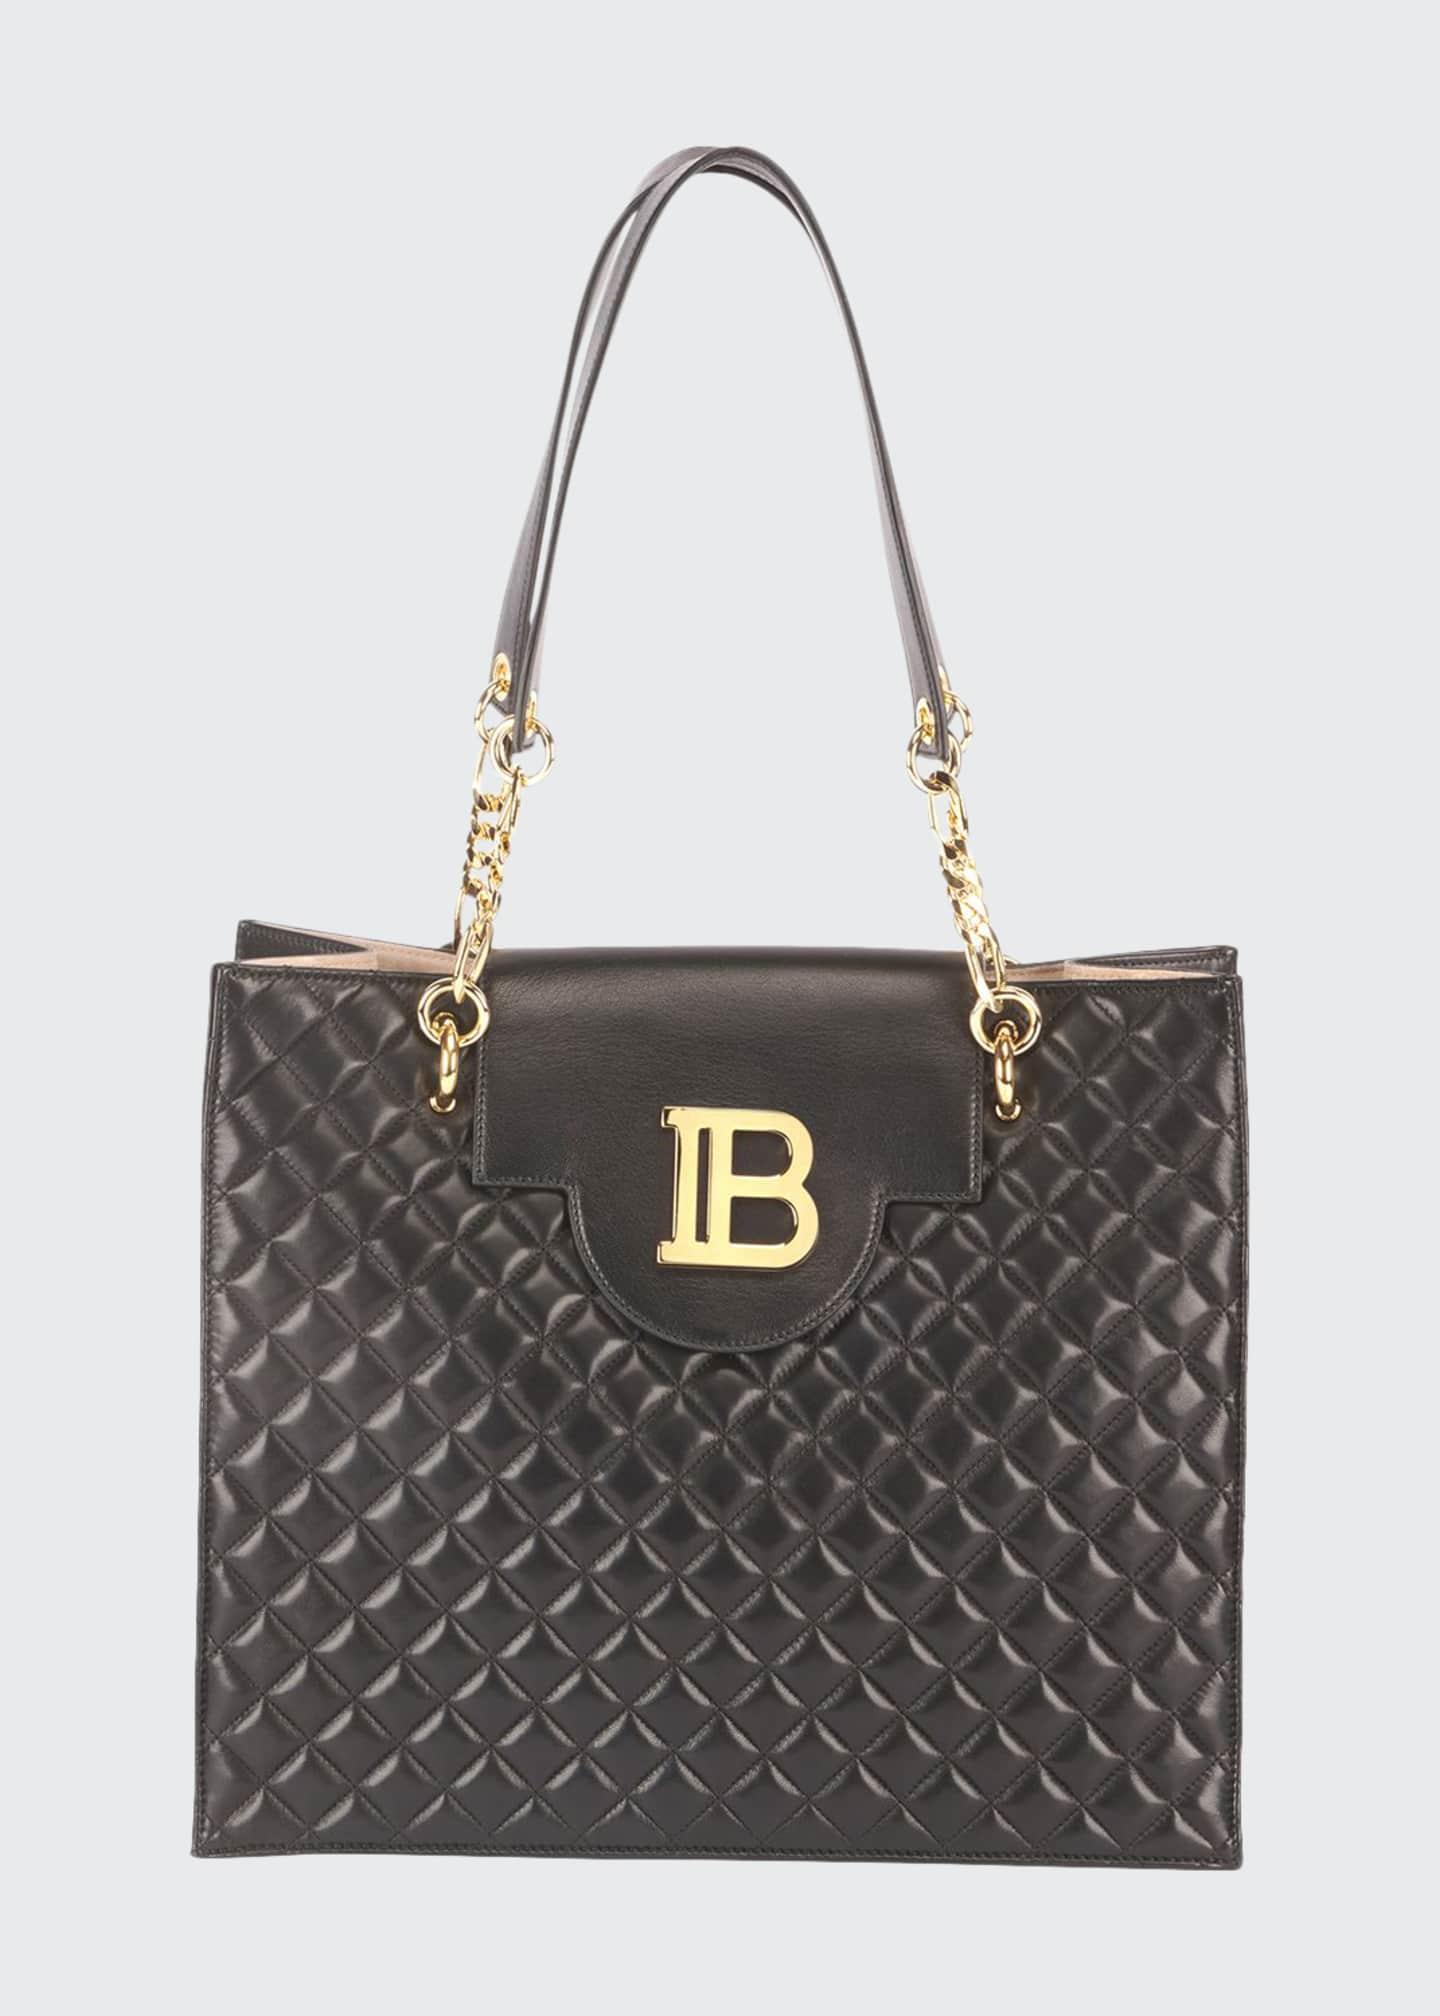 Balmain B Quilted Lambskin Shopper Tote Bag